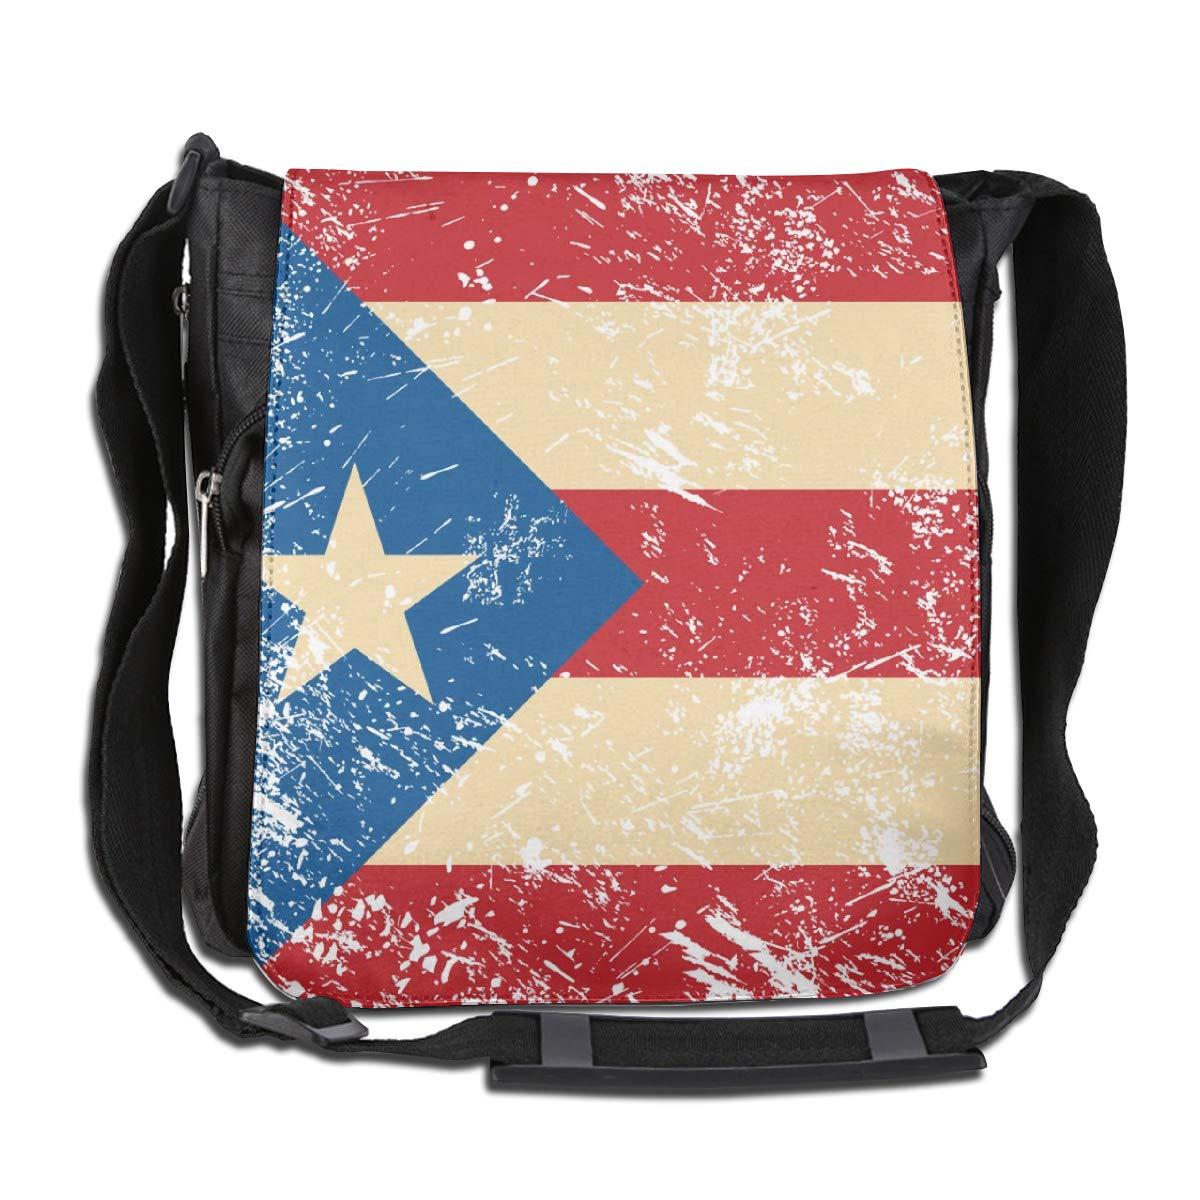 Puerto Rico Retro Flag Men Women Inspirational Satchel Messenger Bags Crossbody Sling Working Bag Travel Shoulder Bags Office//School